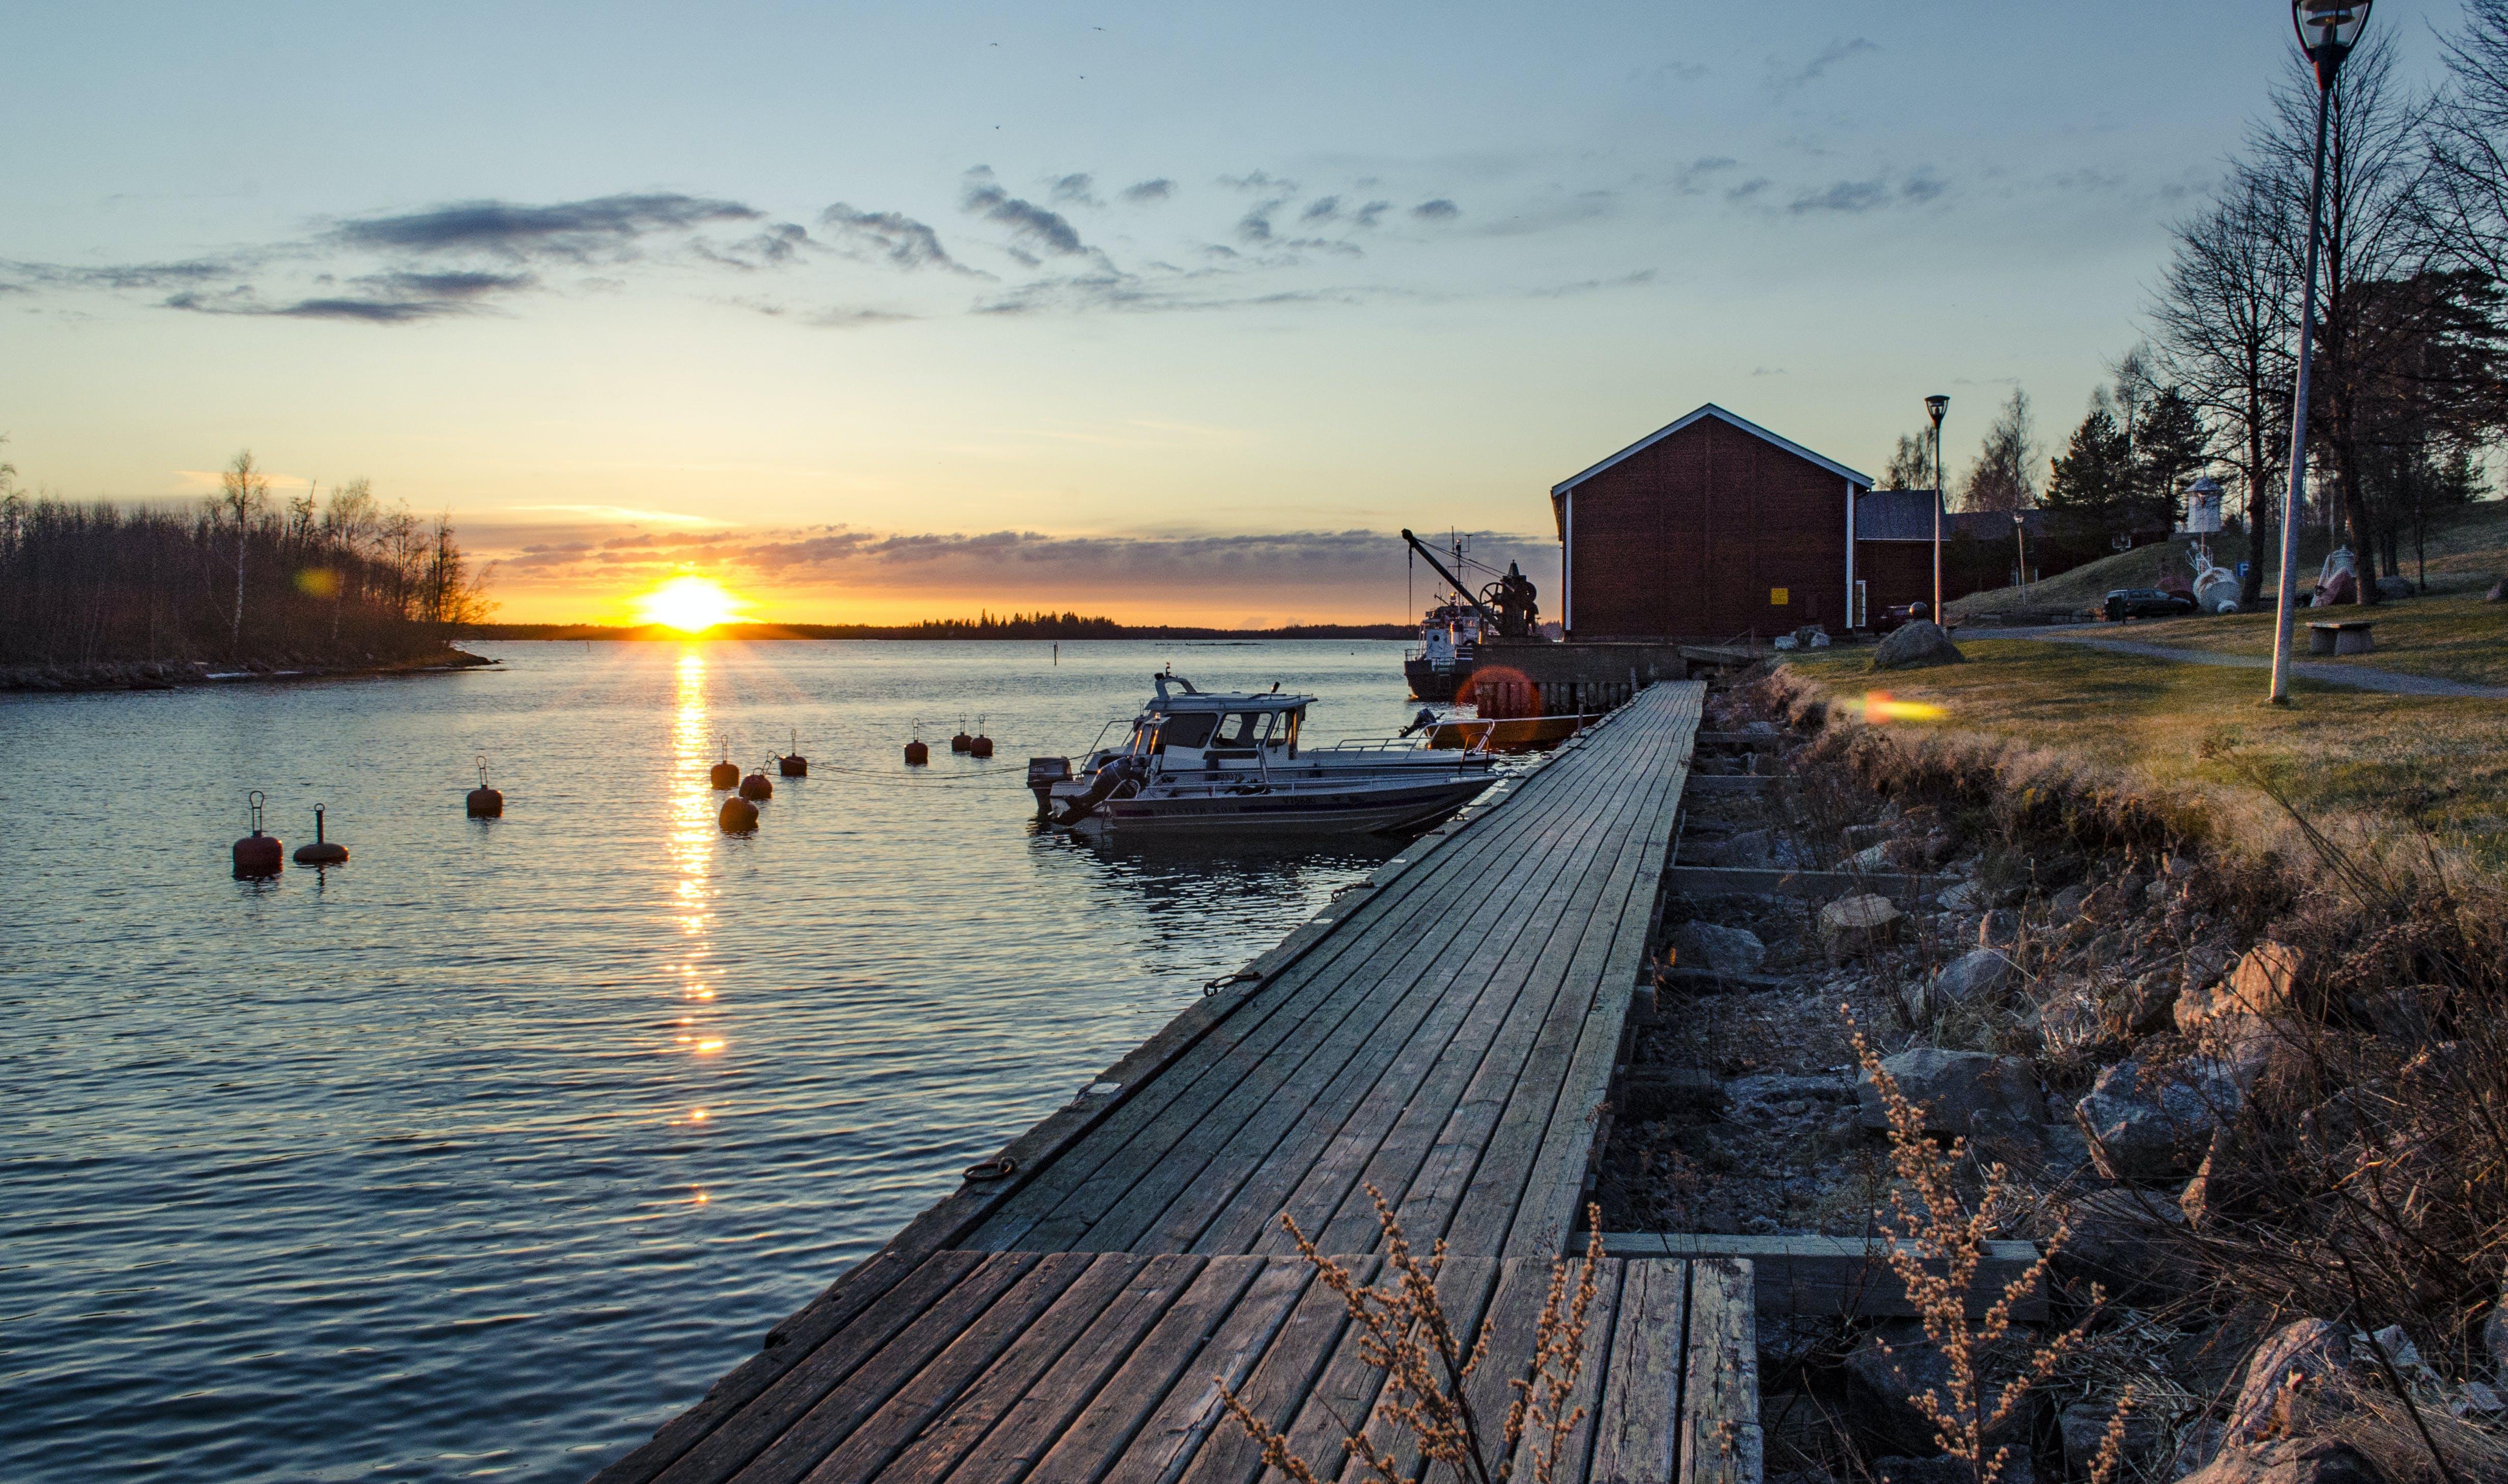 Fotos de stock gratuitas de barca, cielo, finlandés, Finlandia